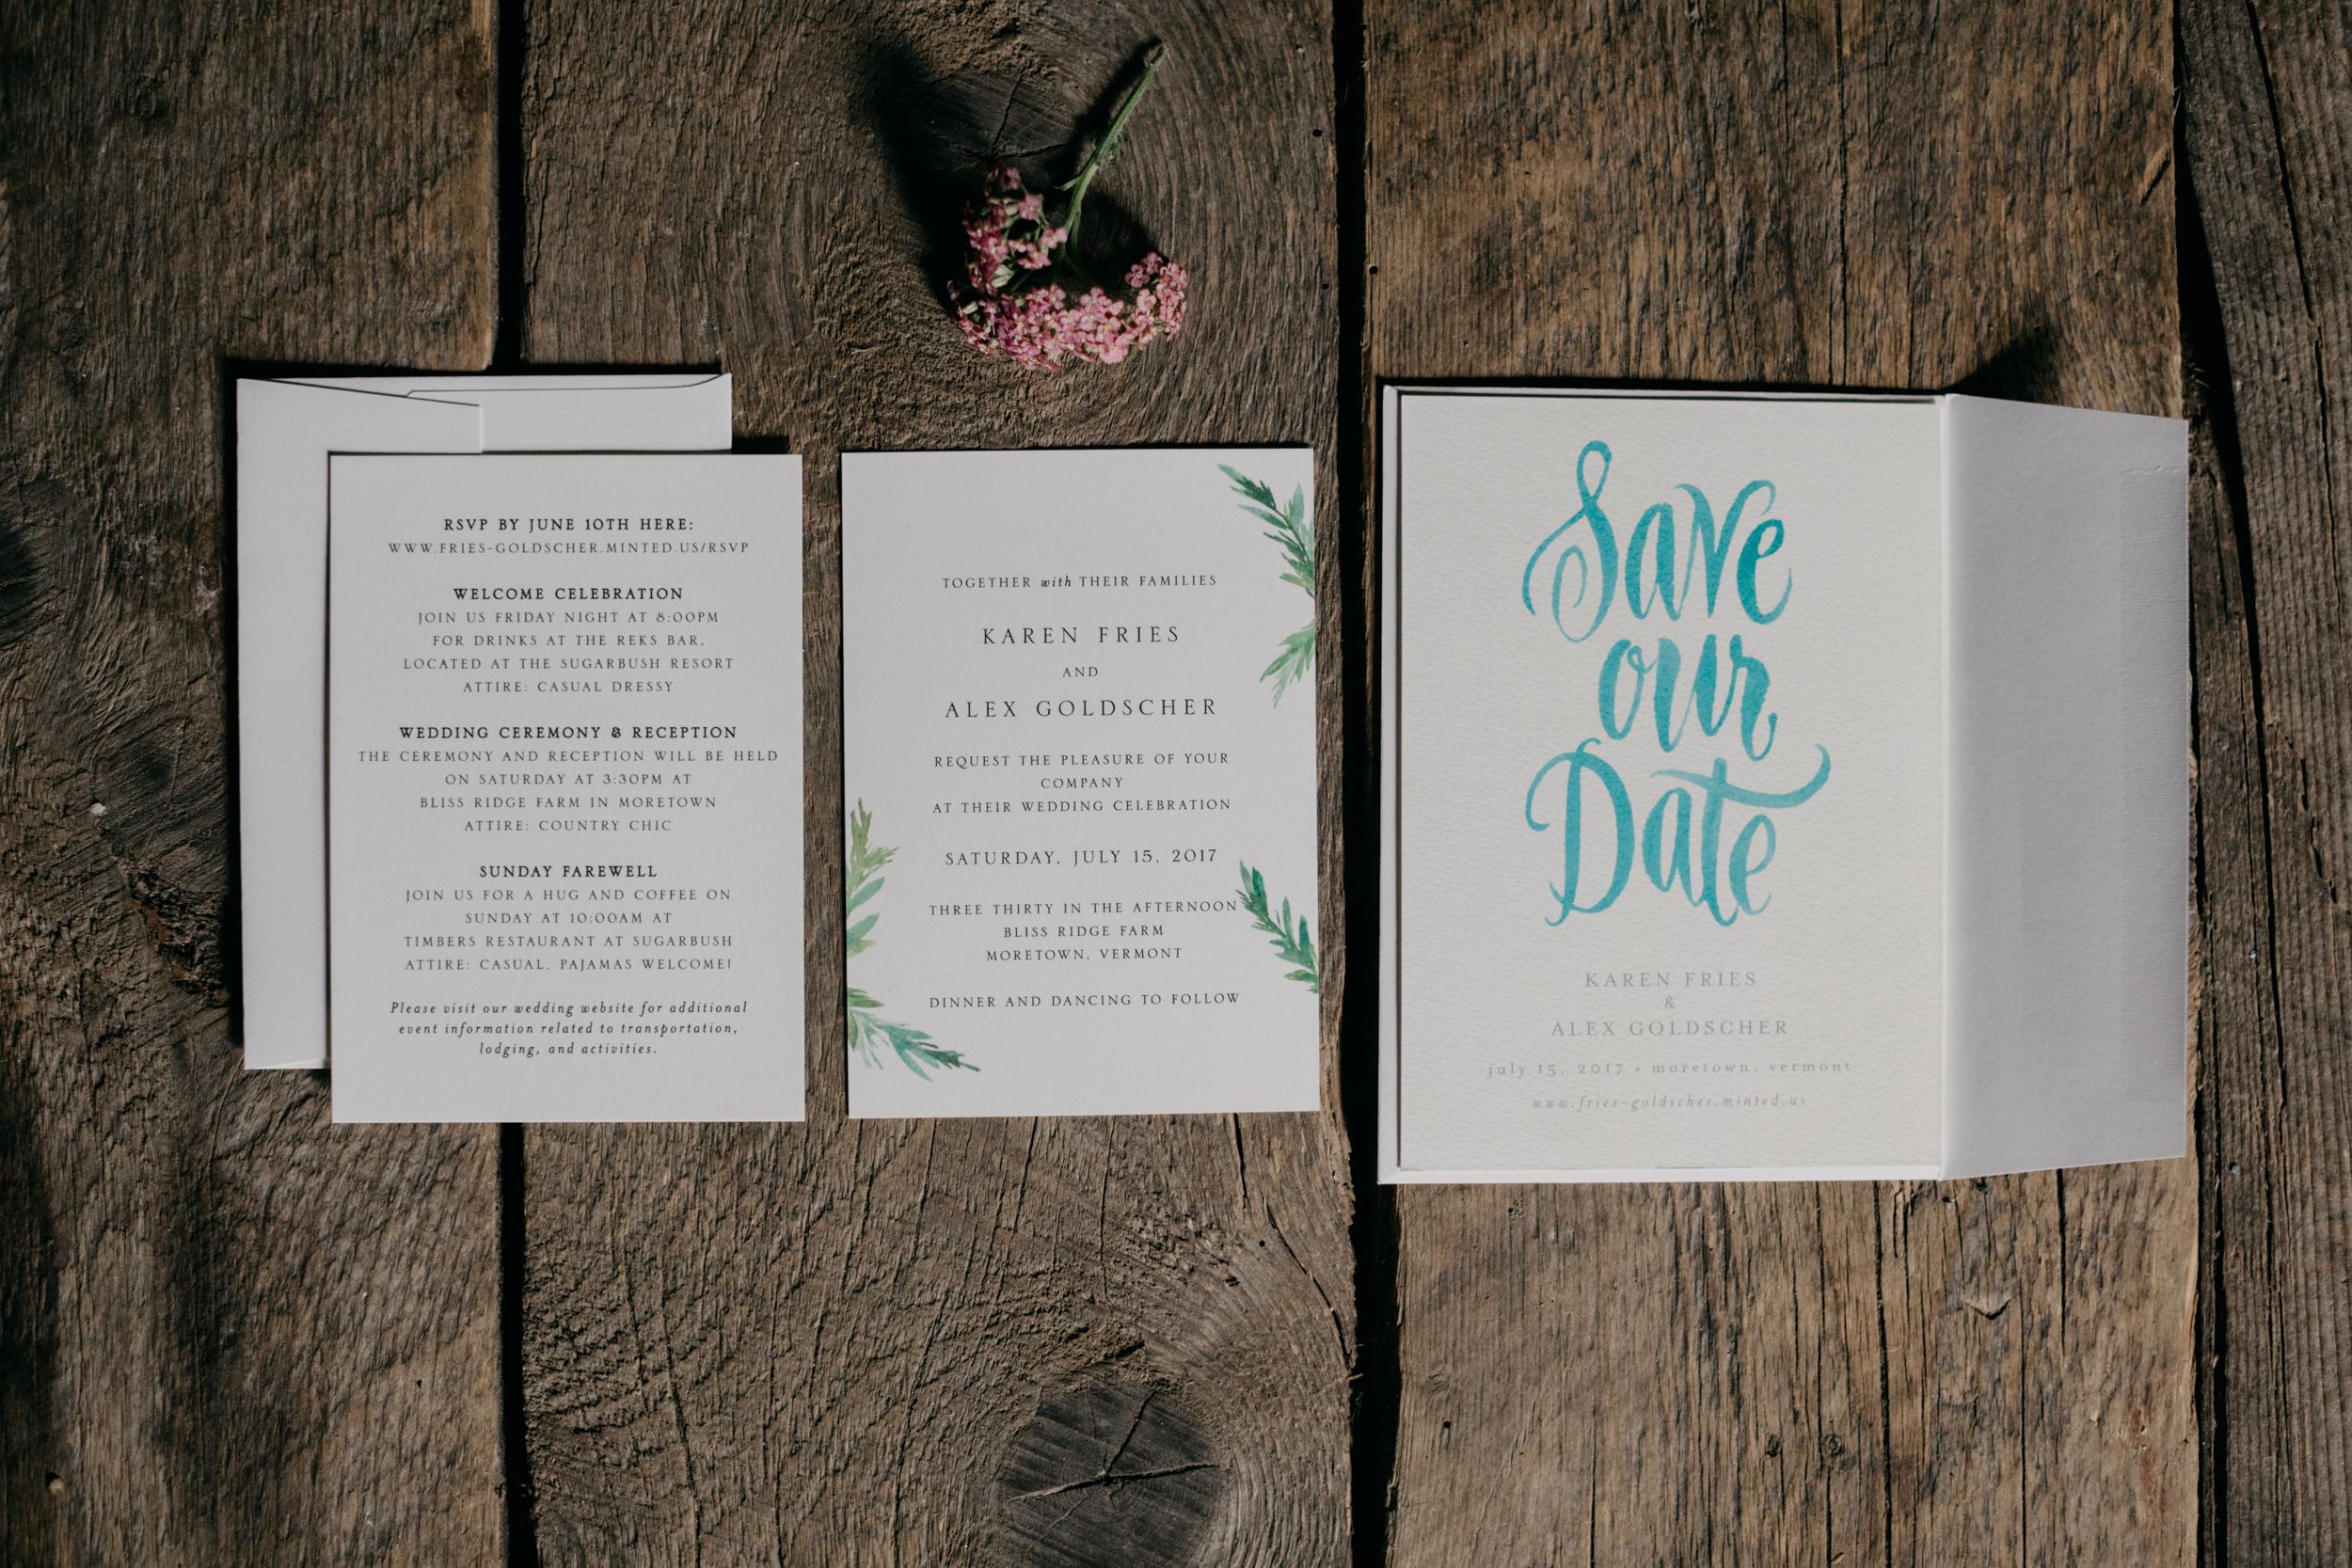 Karen_Alex_Bliss_ridge_farm_Vermont_wedding002.jpg